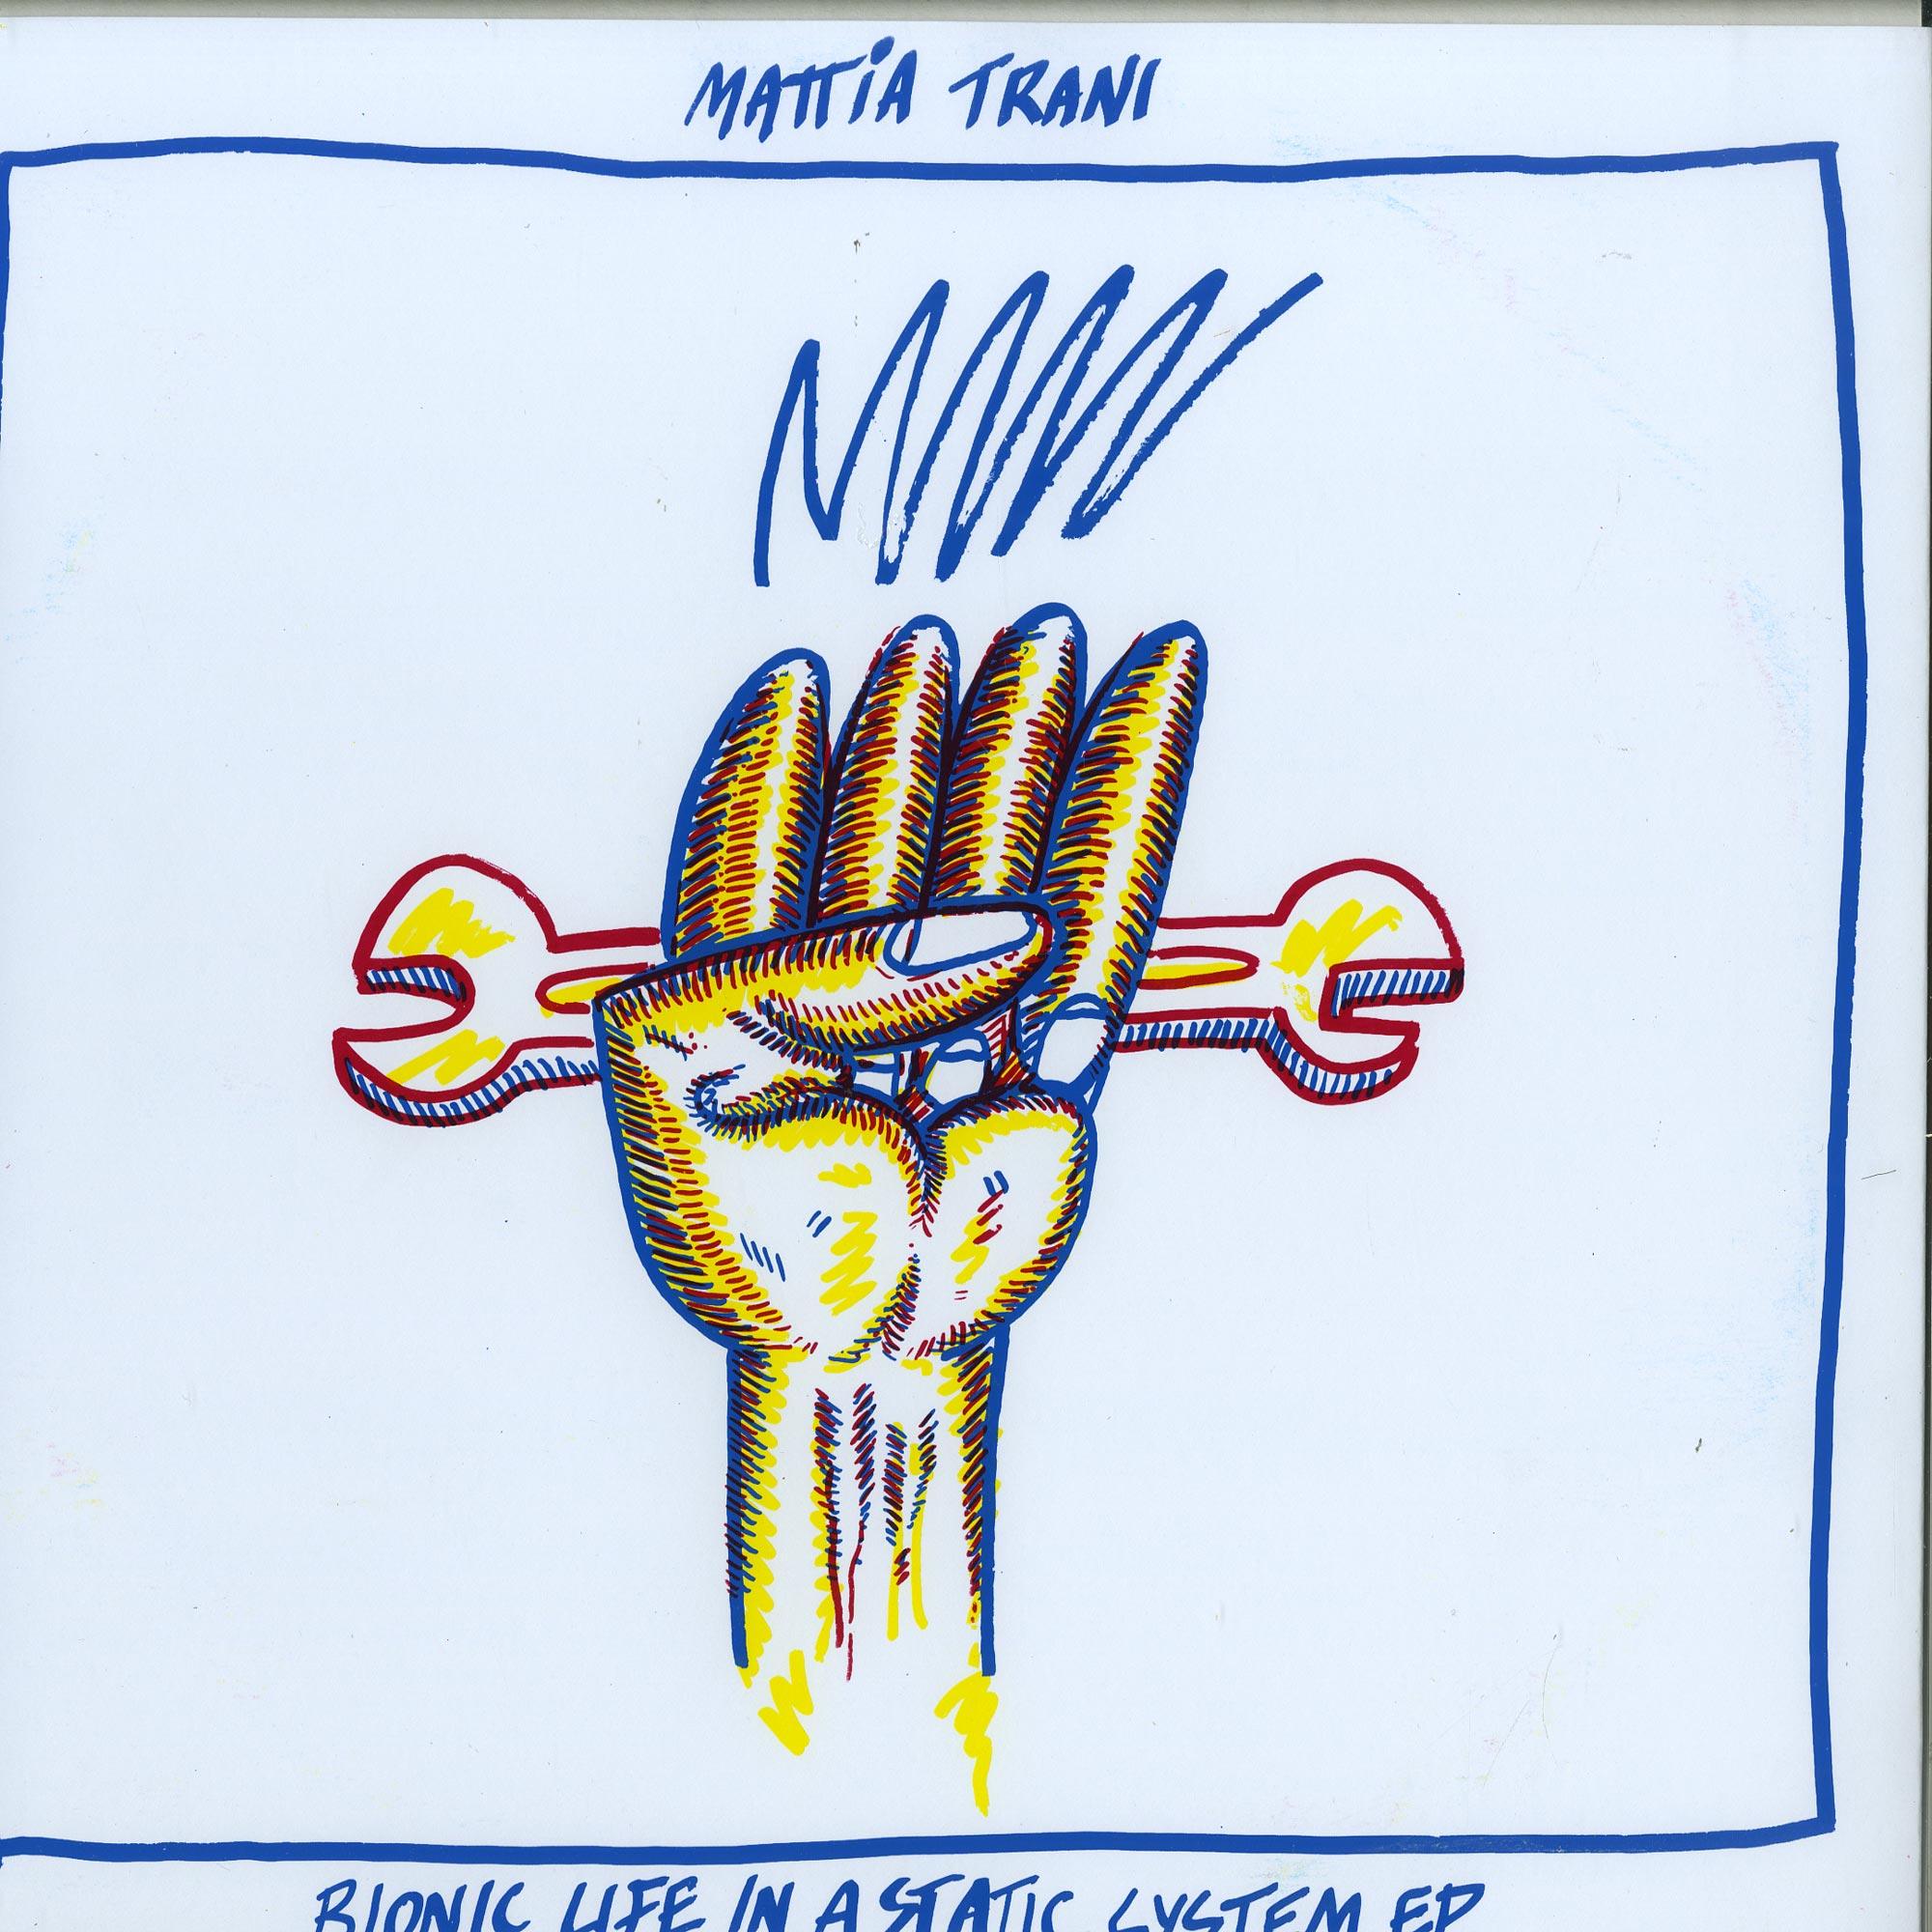 Mattia Trani - BIONIC LIFE IN A STATIC SYSTEM